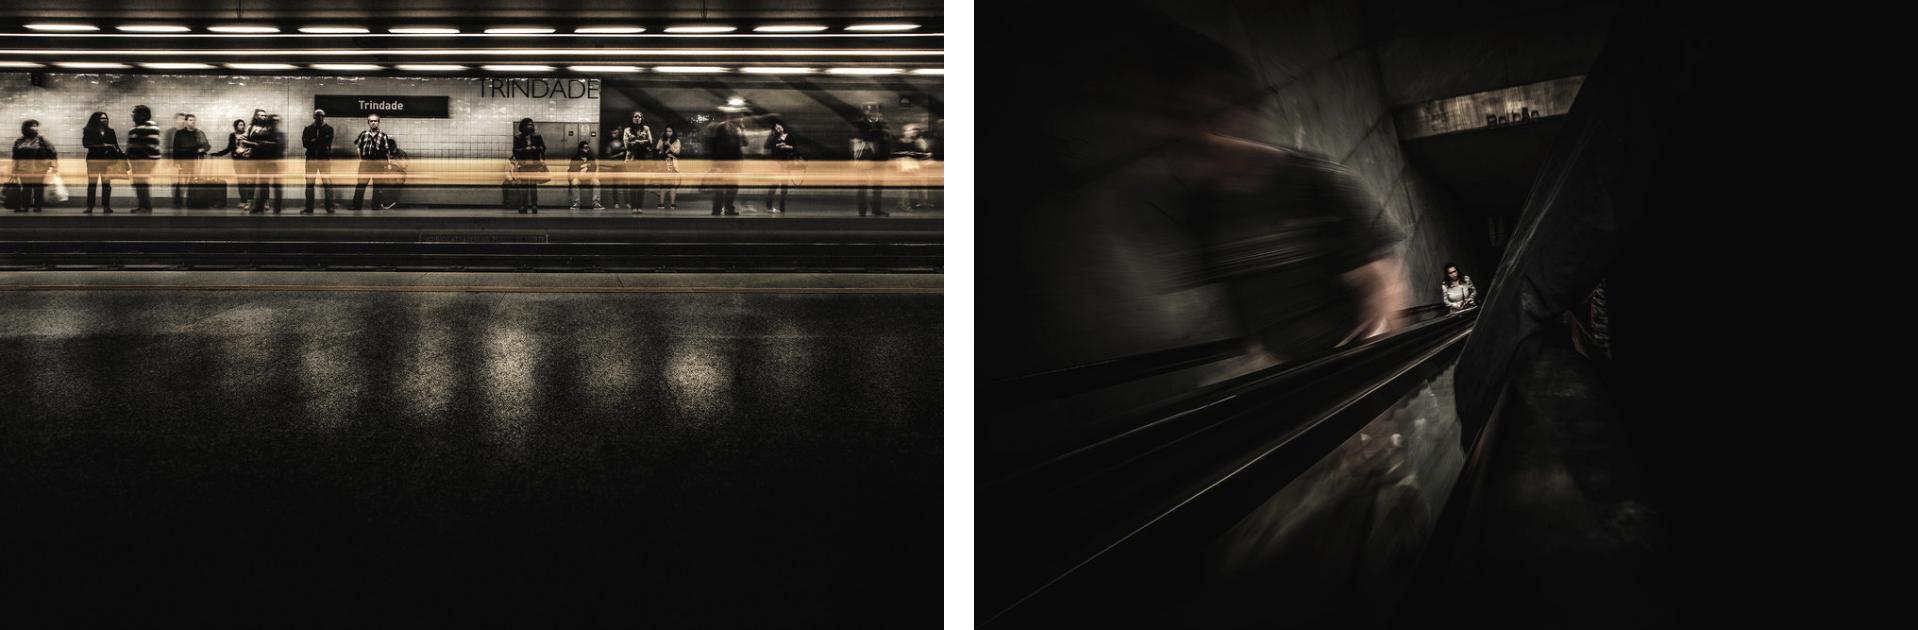 In Transit bonjourmolotov Andre Gigante Photography Experimenta Design 15B.png